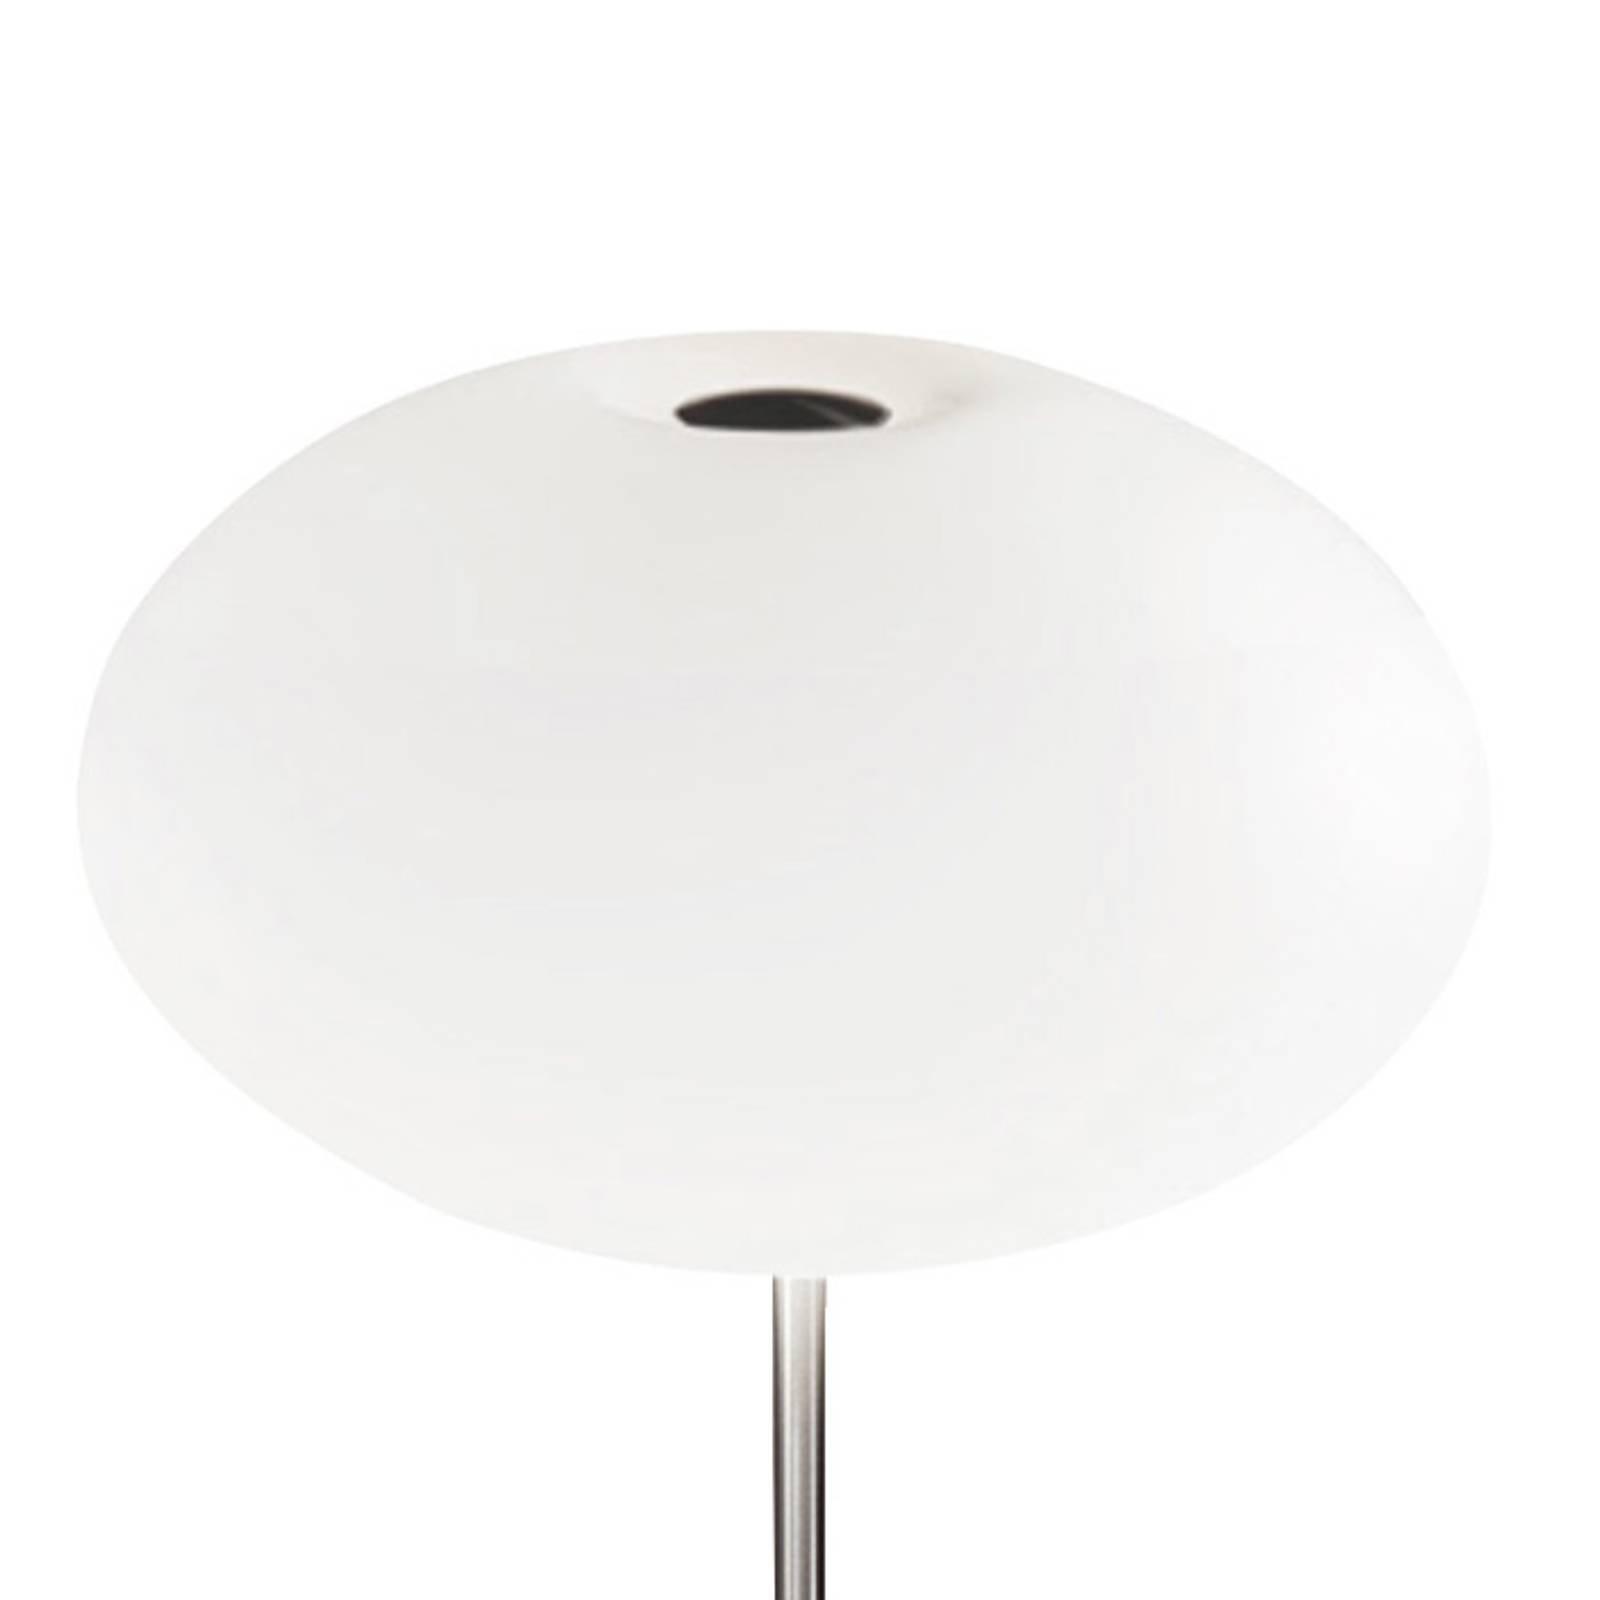 Casablanca Aih bordlampe, Ø 28 cm hvit matt